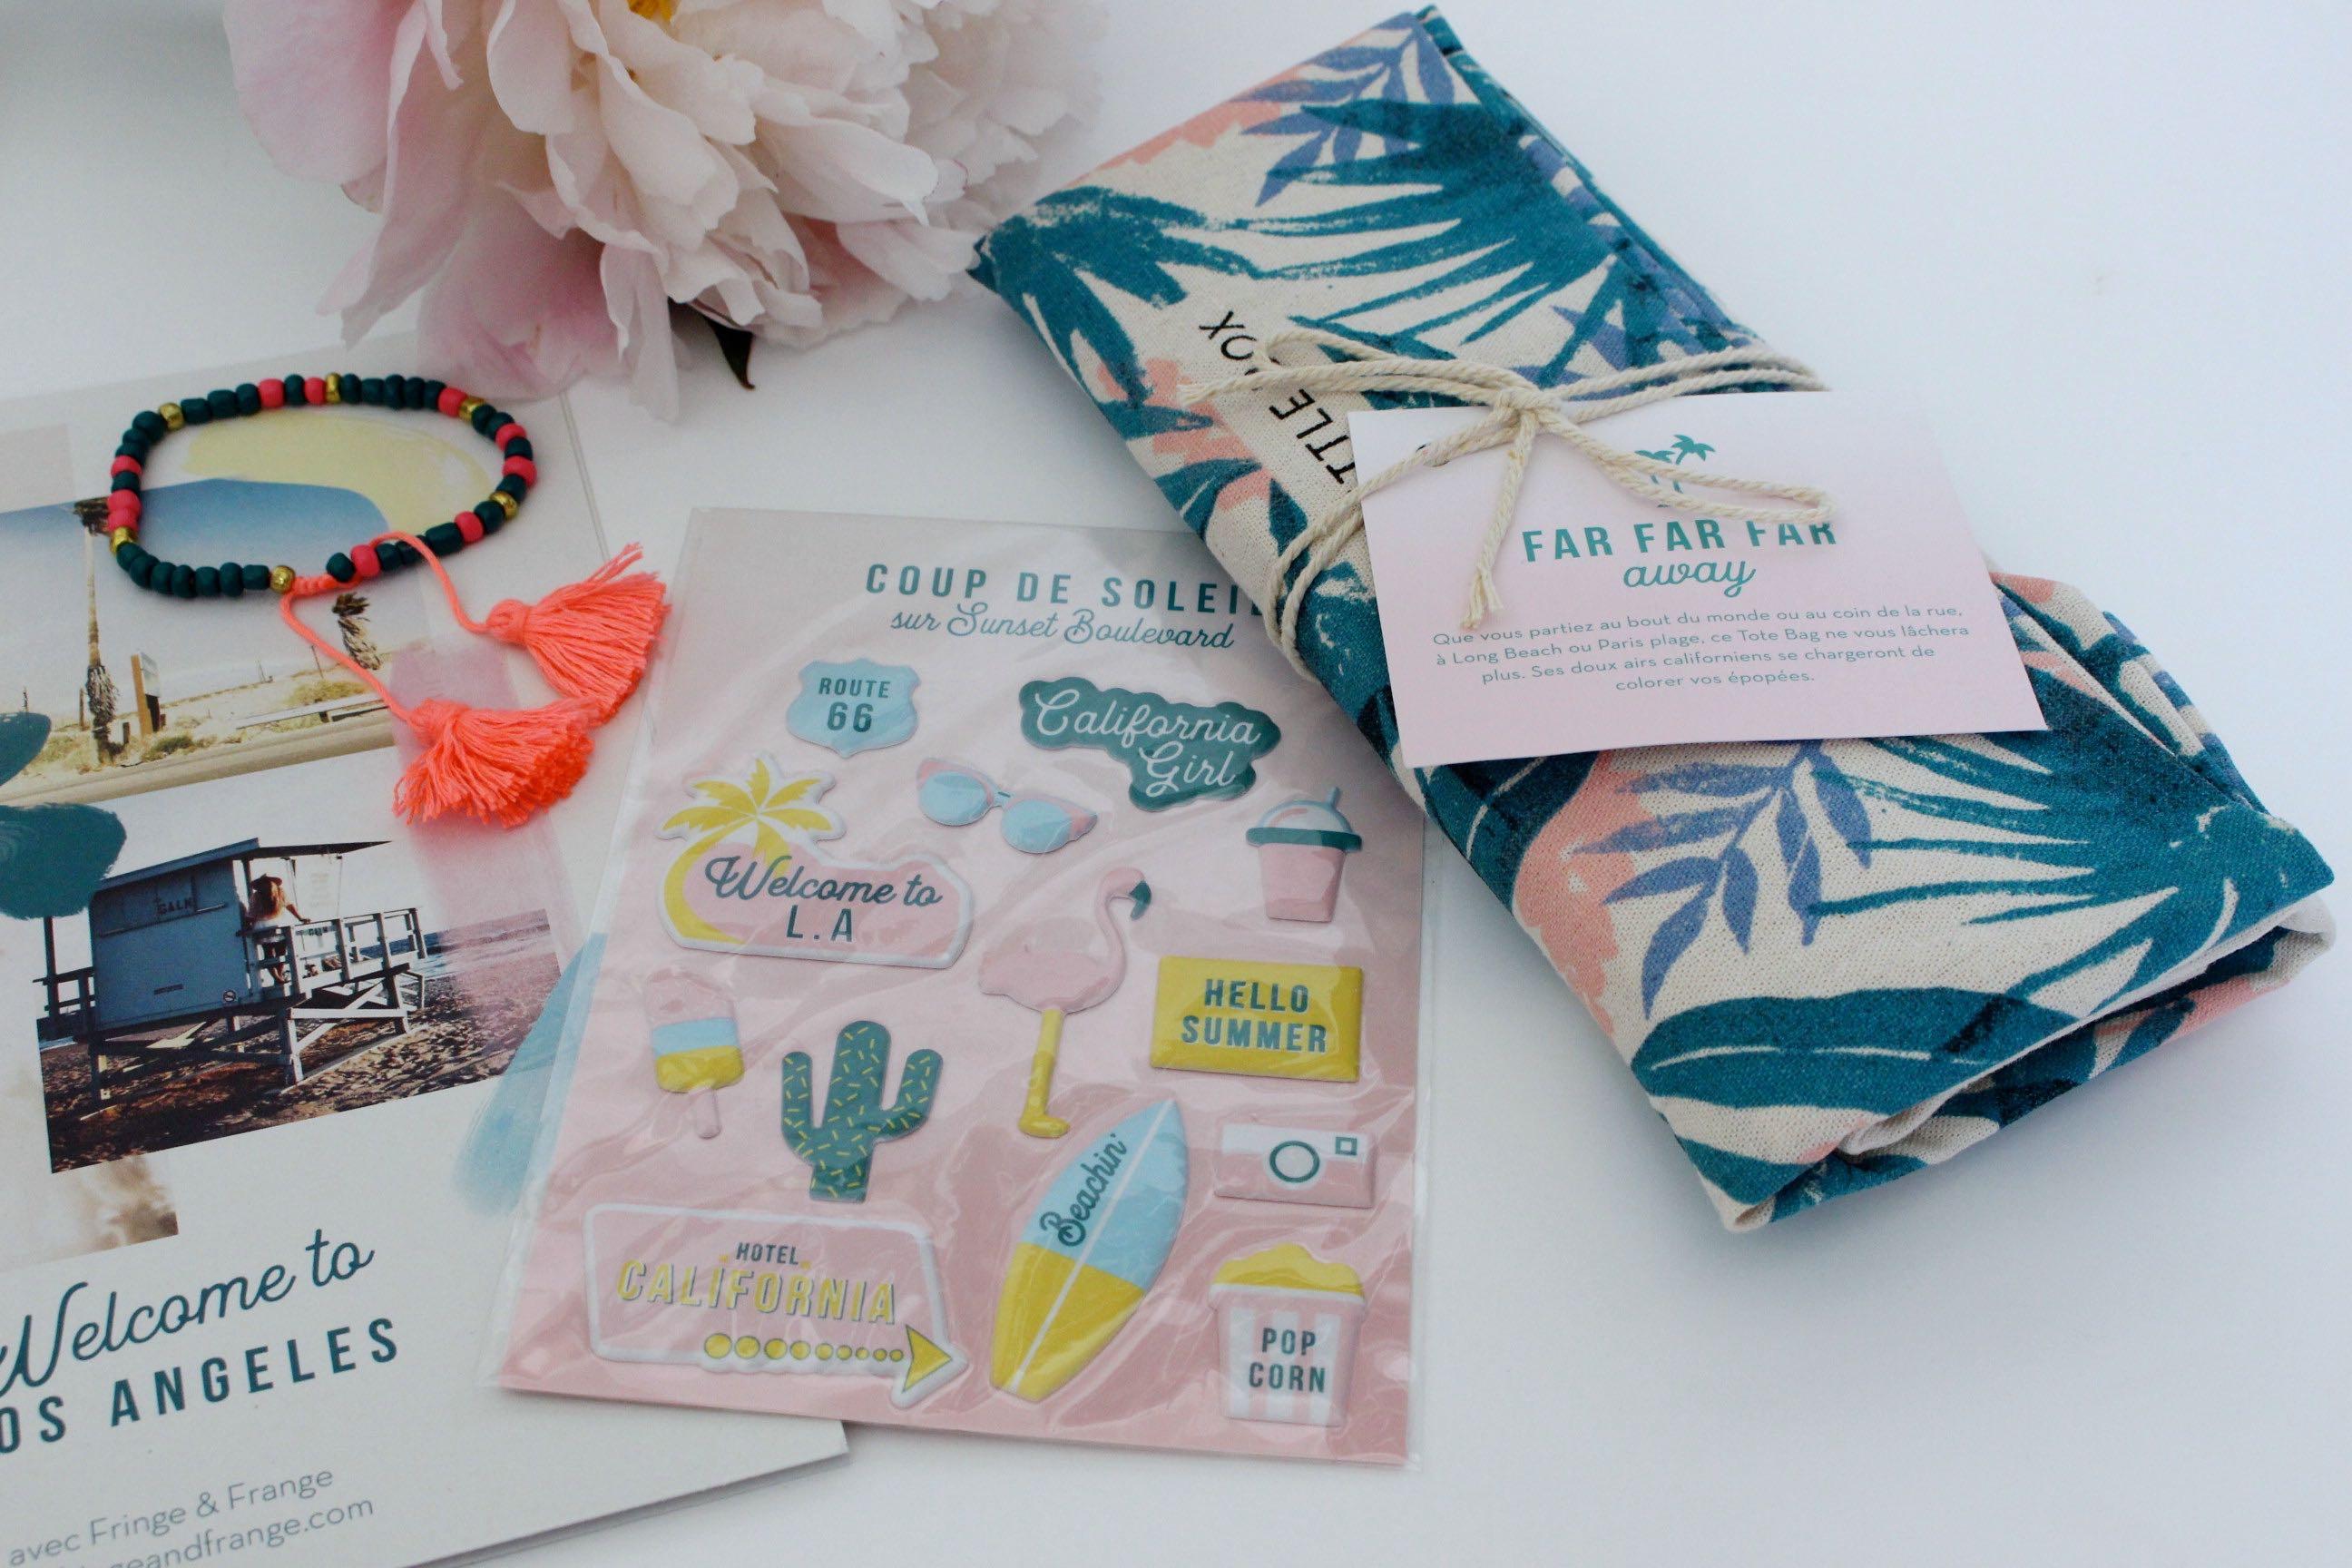 My Little box juin los angeles accessoires mademoiselle-e